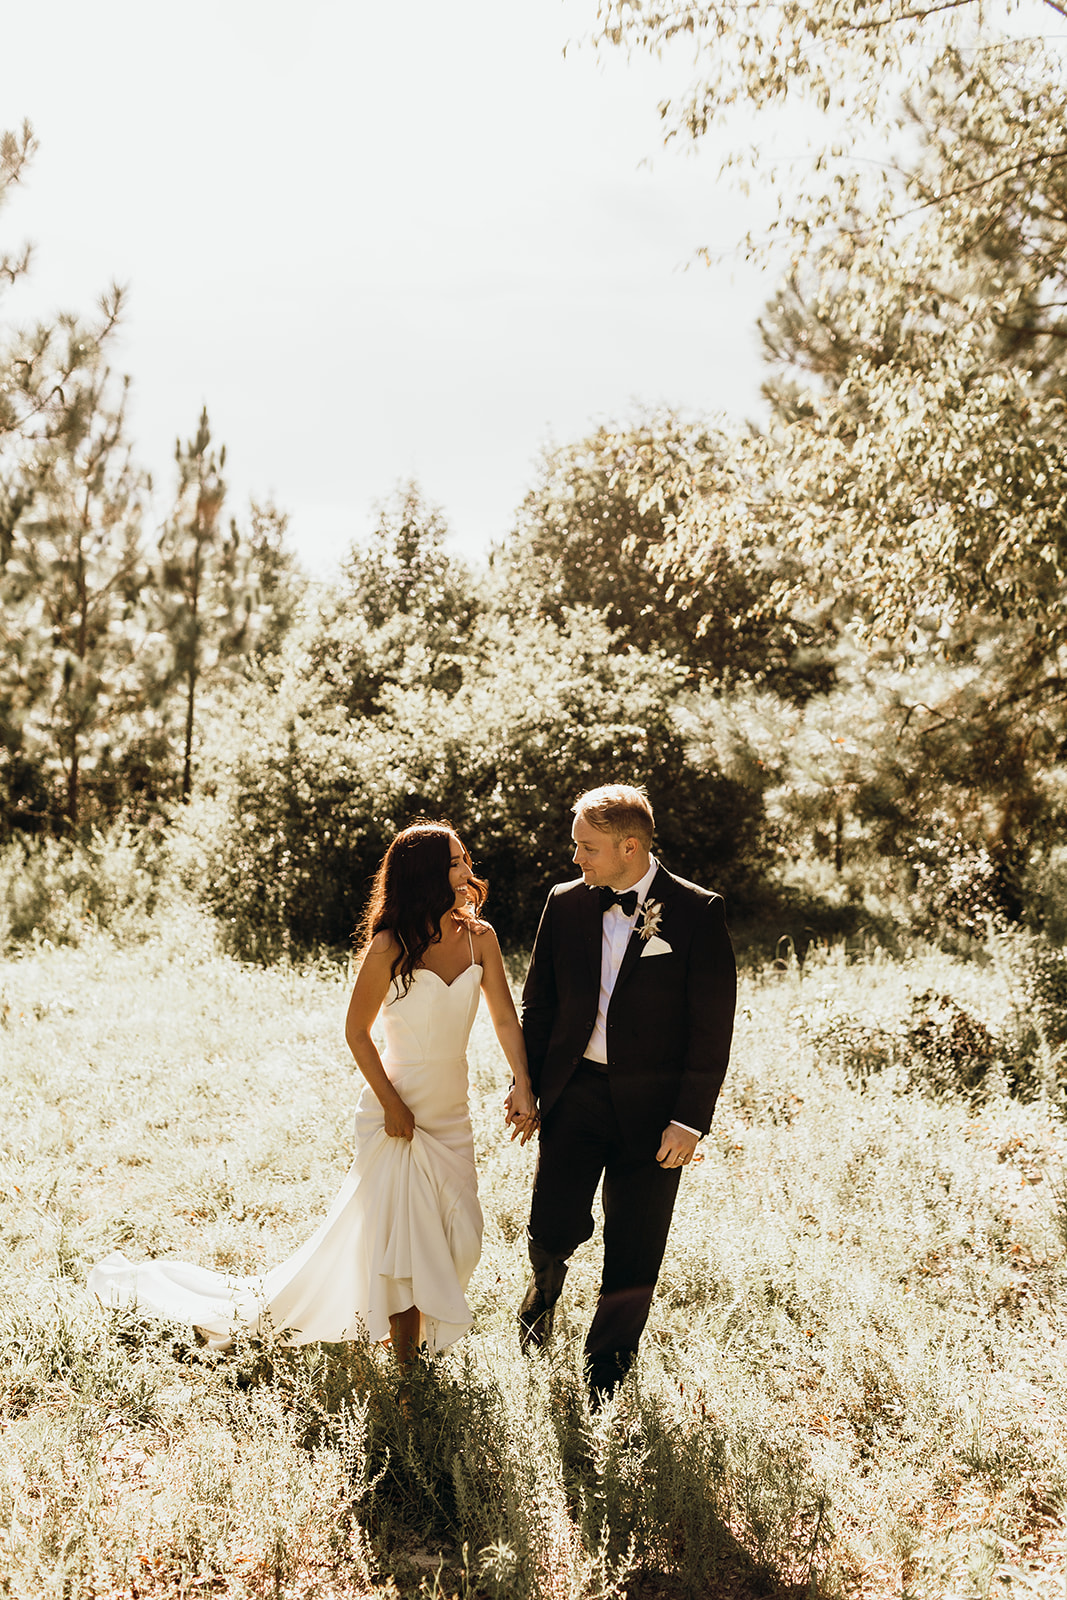 Casey-Josh-Pearl-In-The-Wild-Tallahassee-Wedding-151_websize.jpg